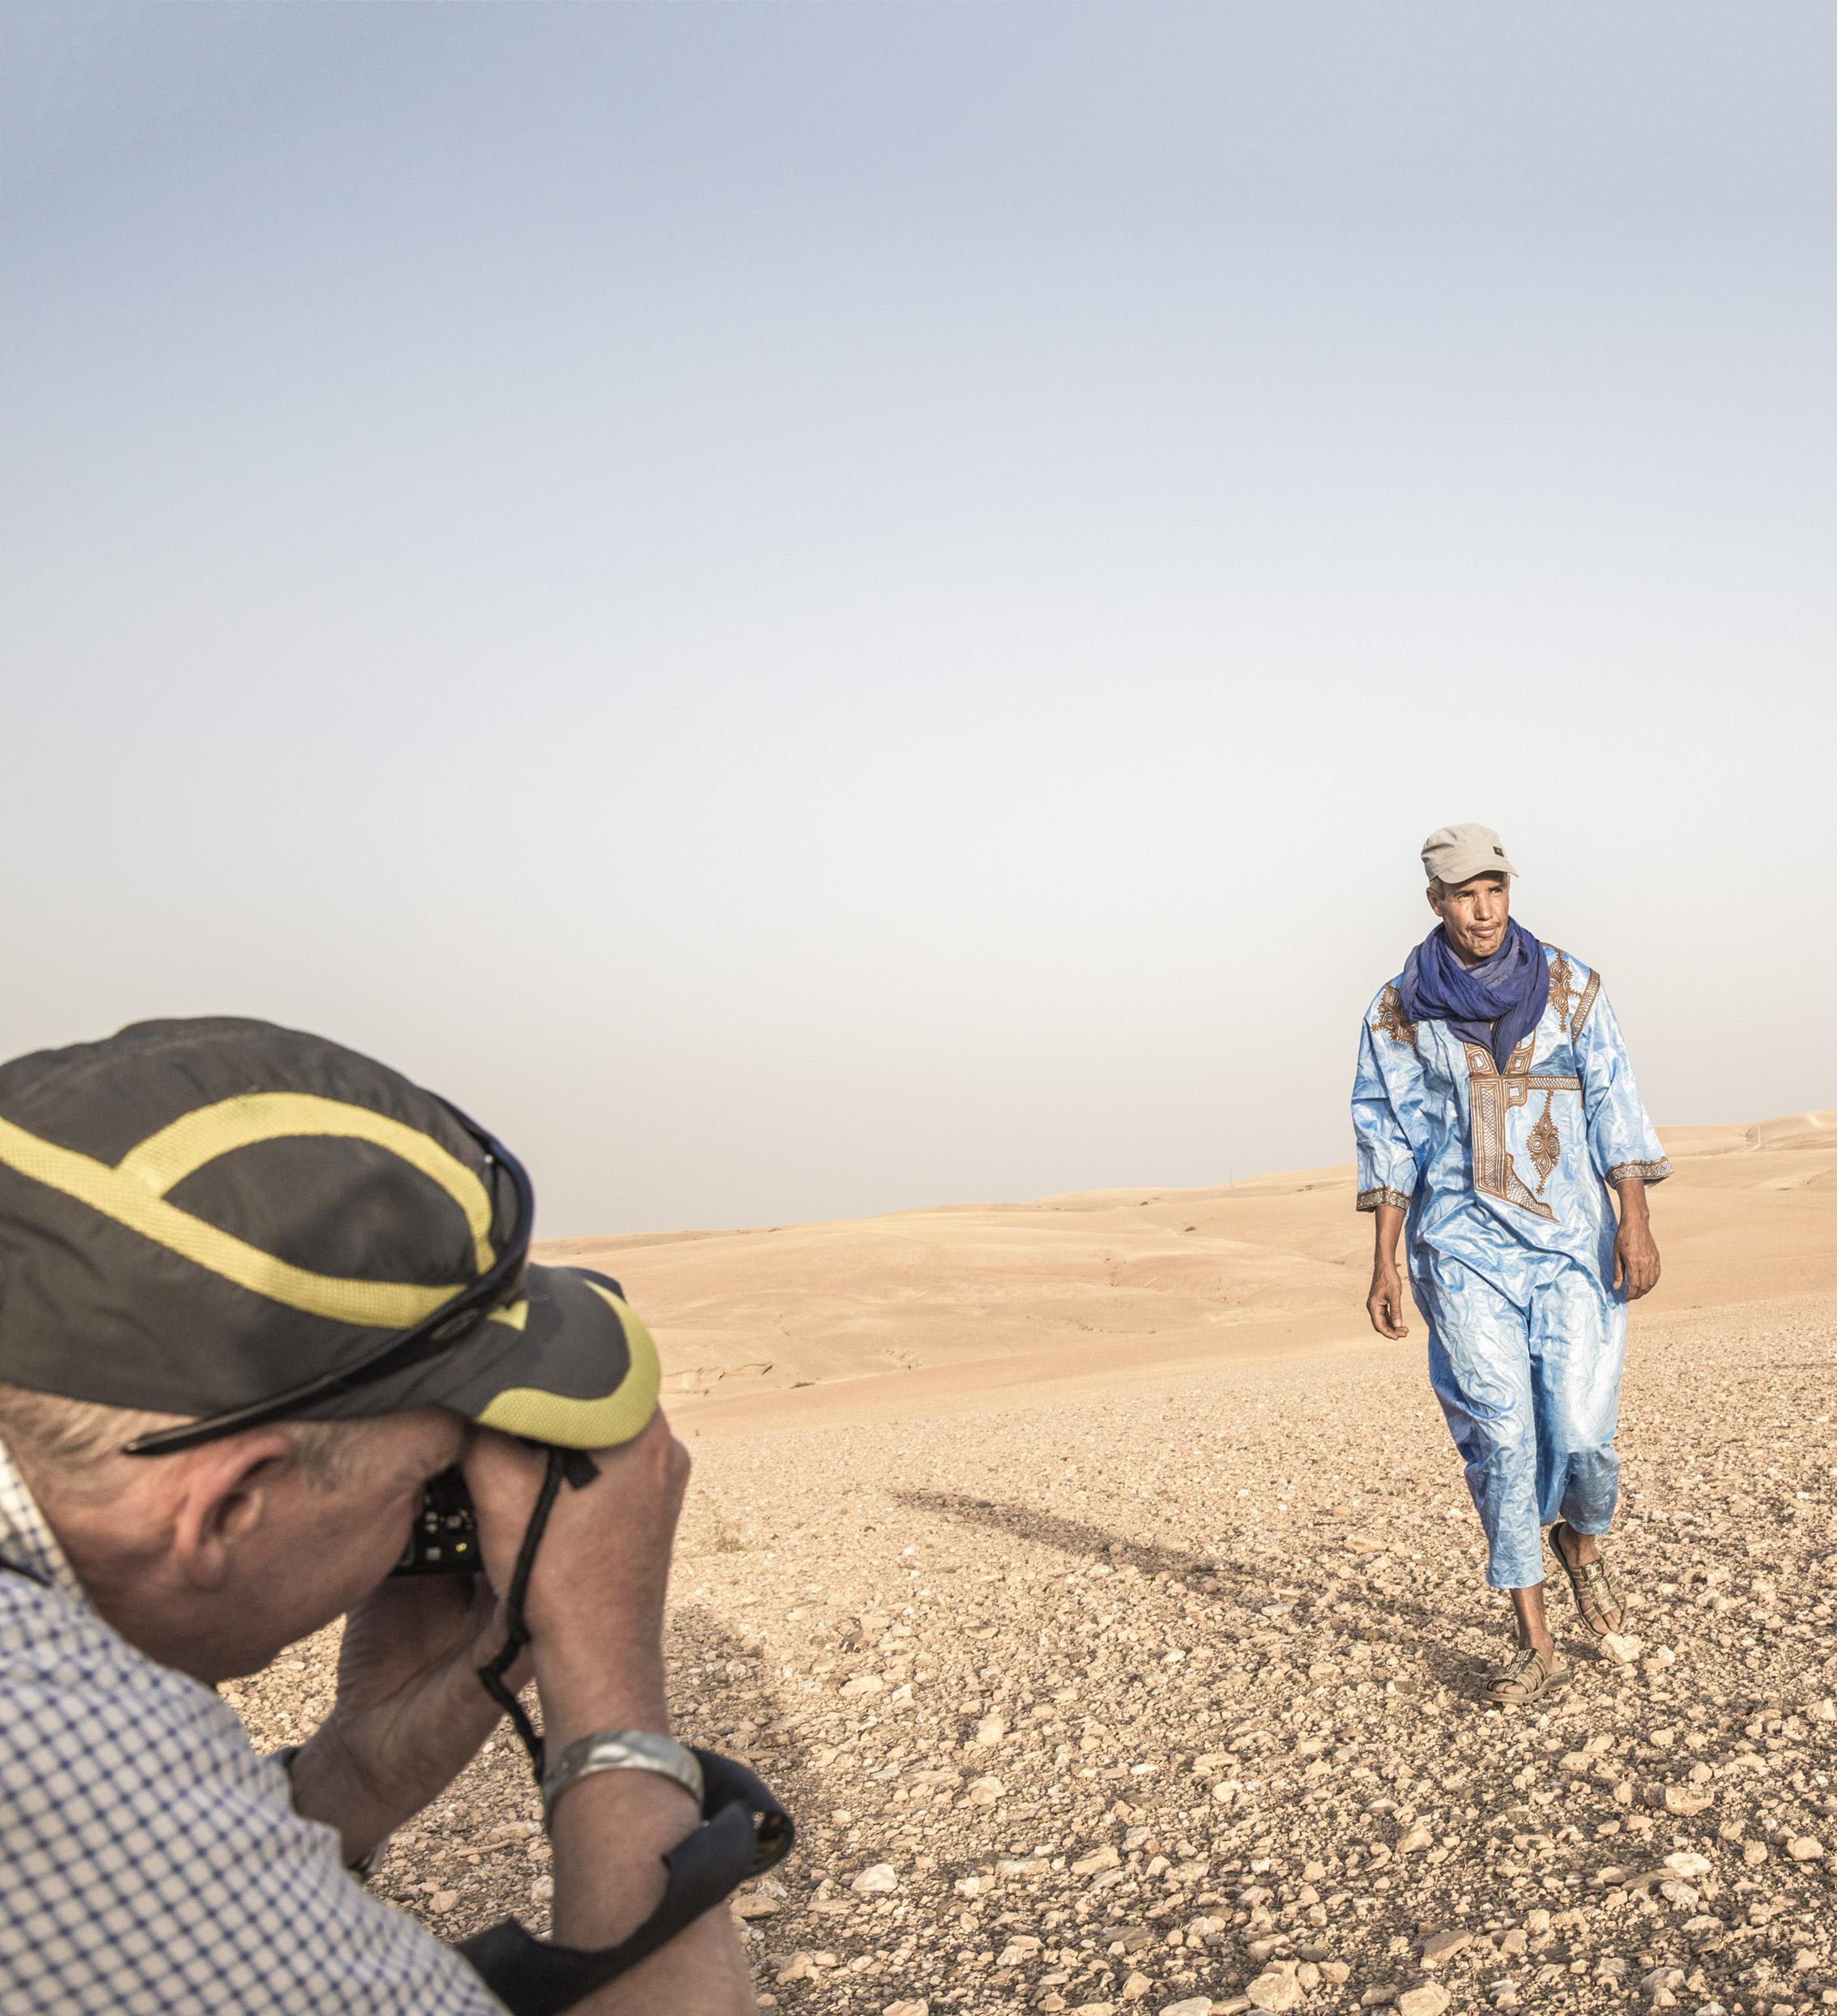 Photo tour in the desert, Marrakesh